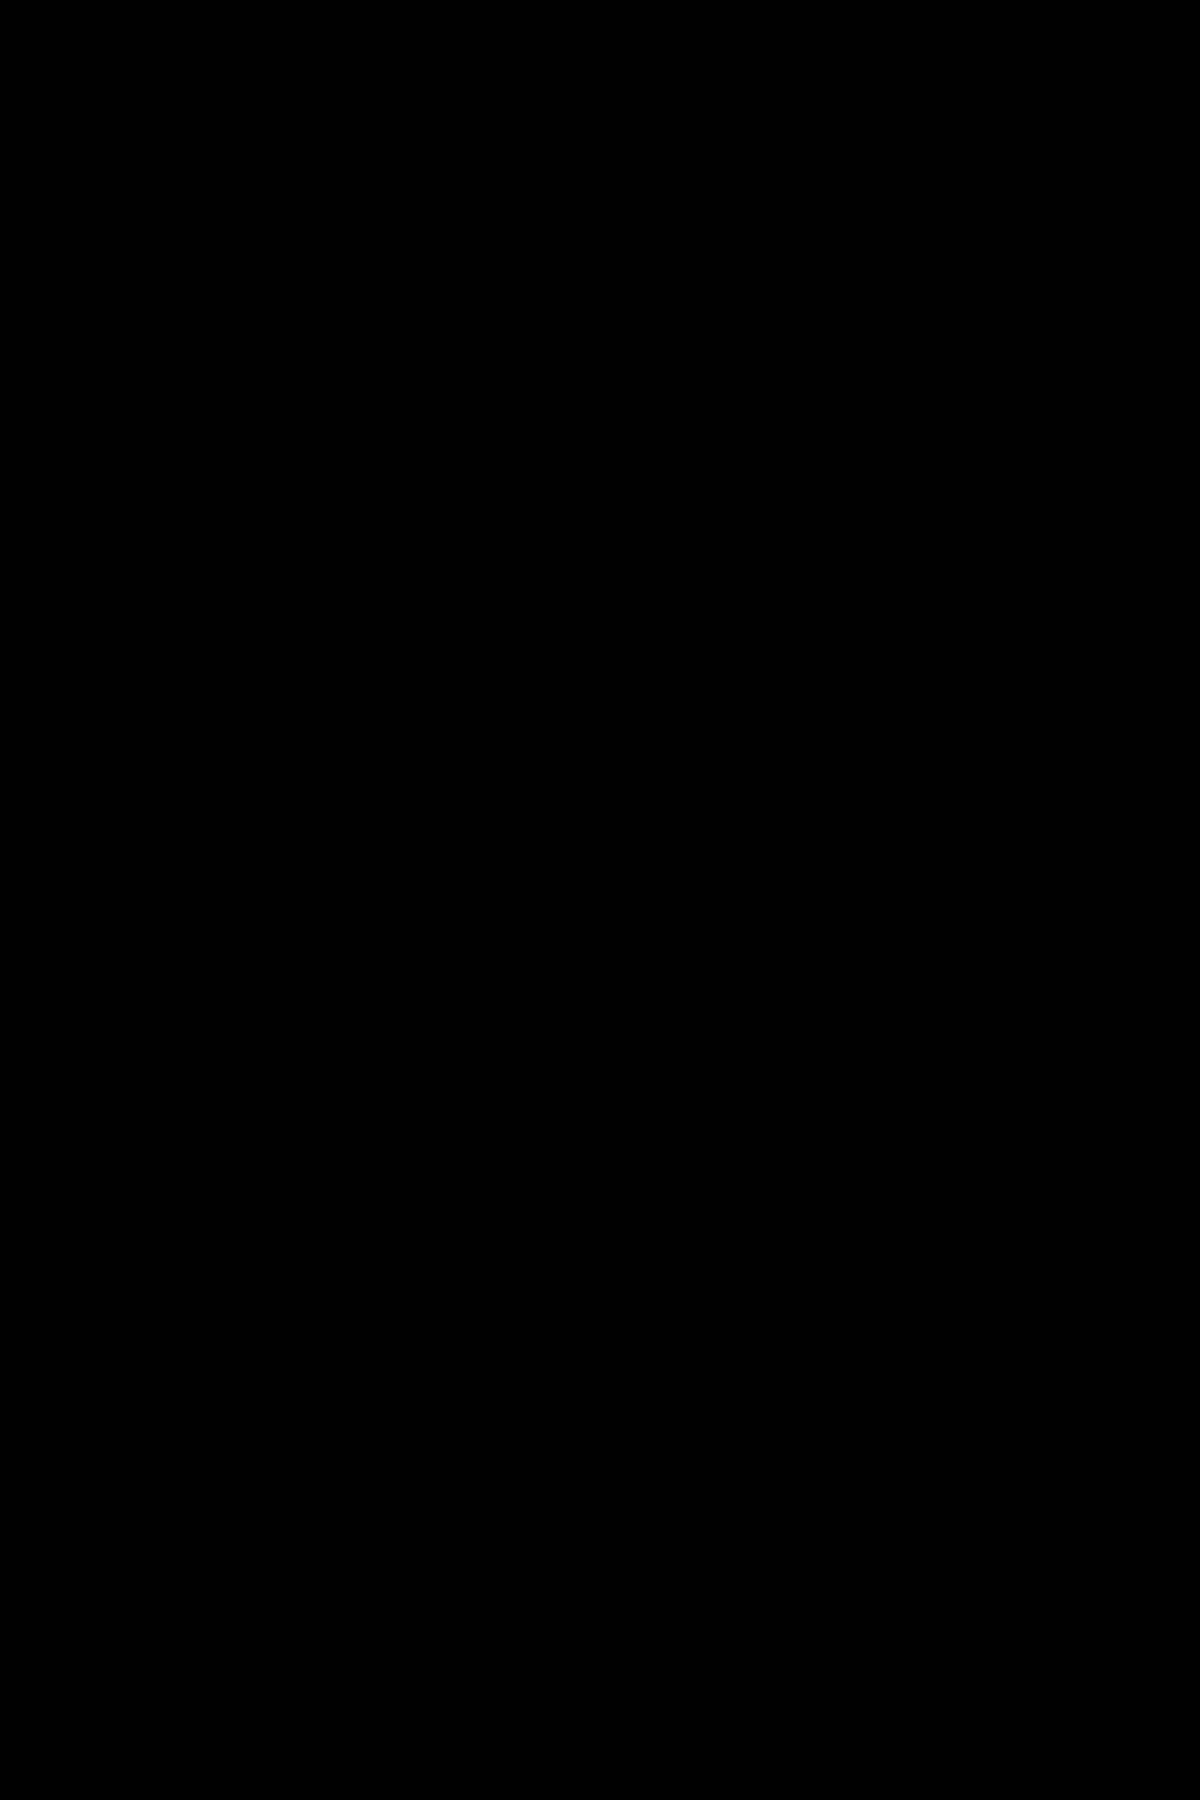 illuminated_dimensional_lettering_steel-detail